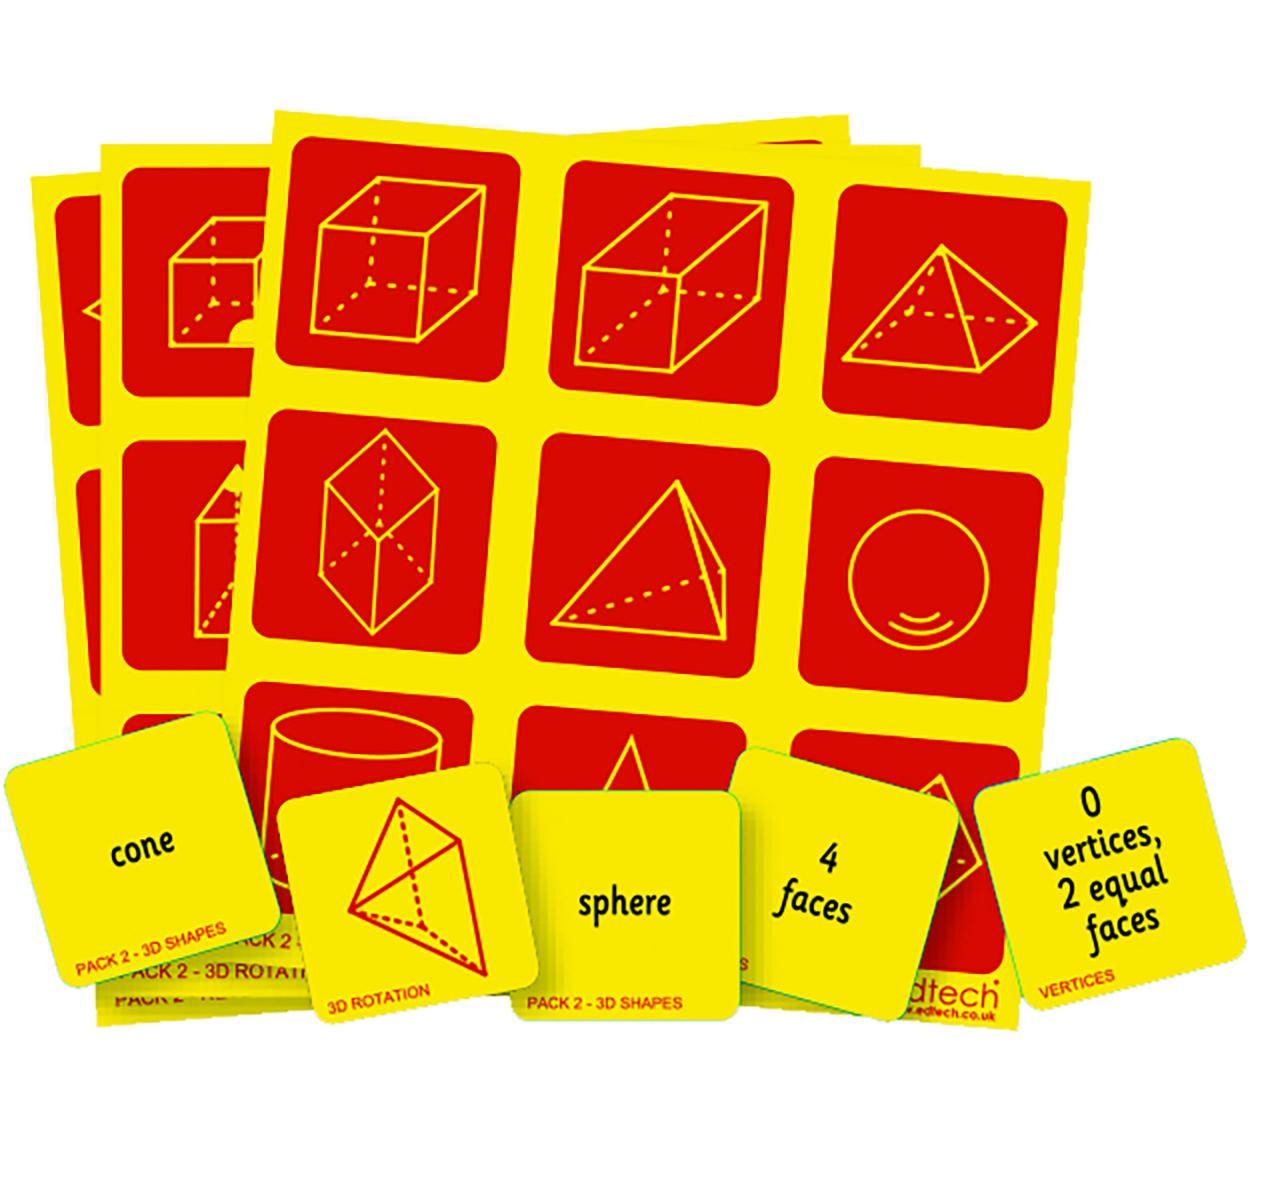 3D Shape Bingo - 3D Shape Bingo Free Printable